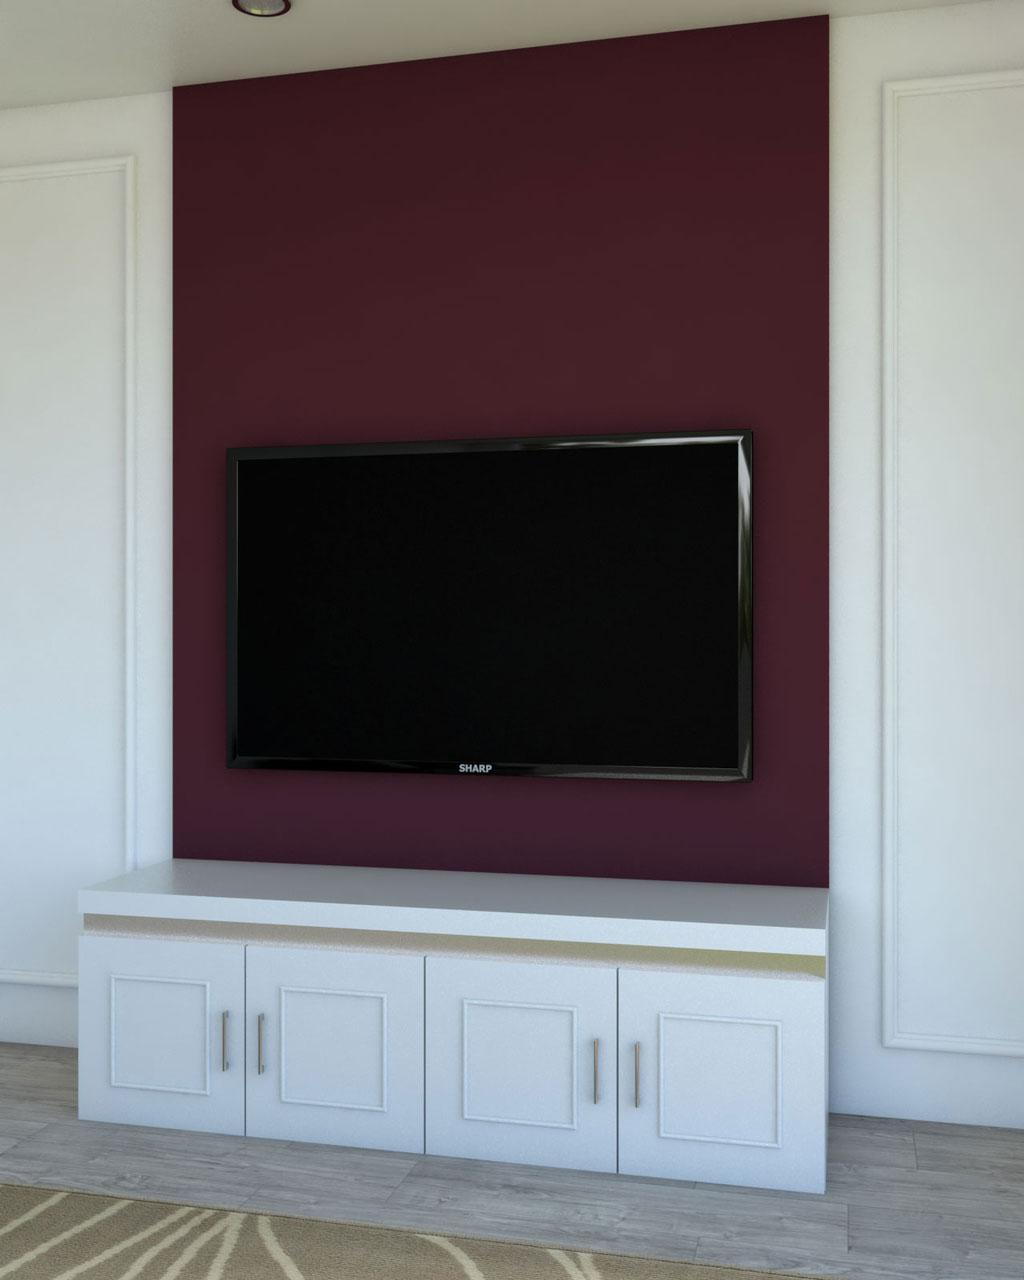 Glamorous burgundy accent wall ideas behind flat screen tv